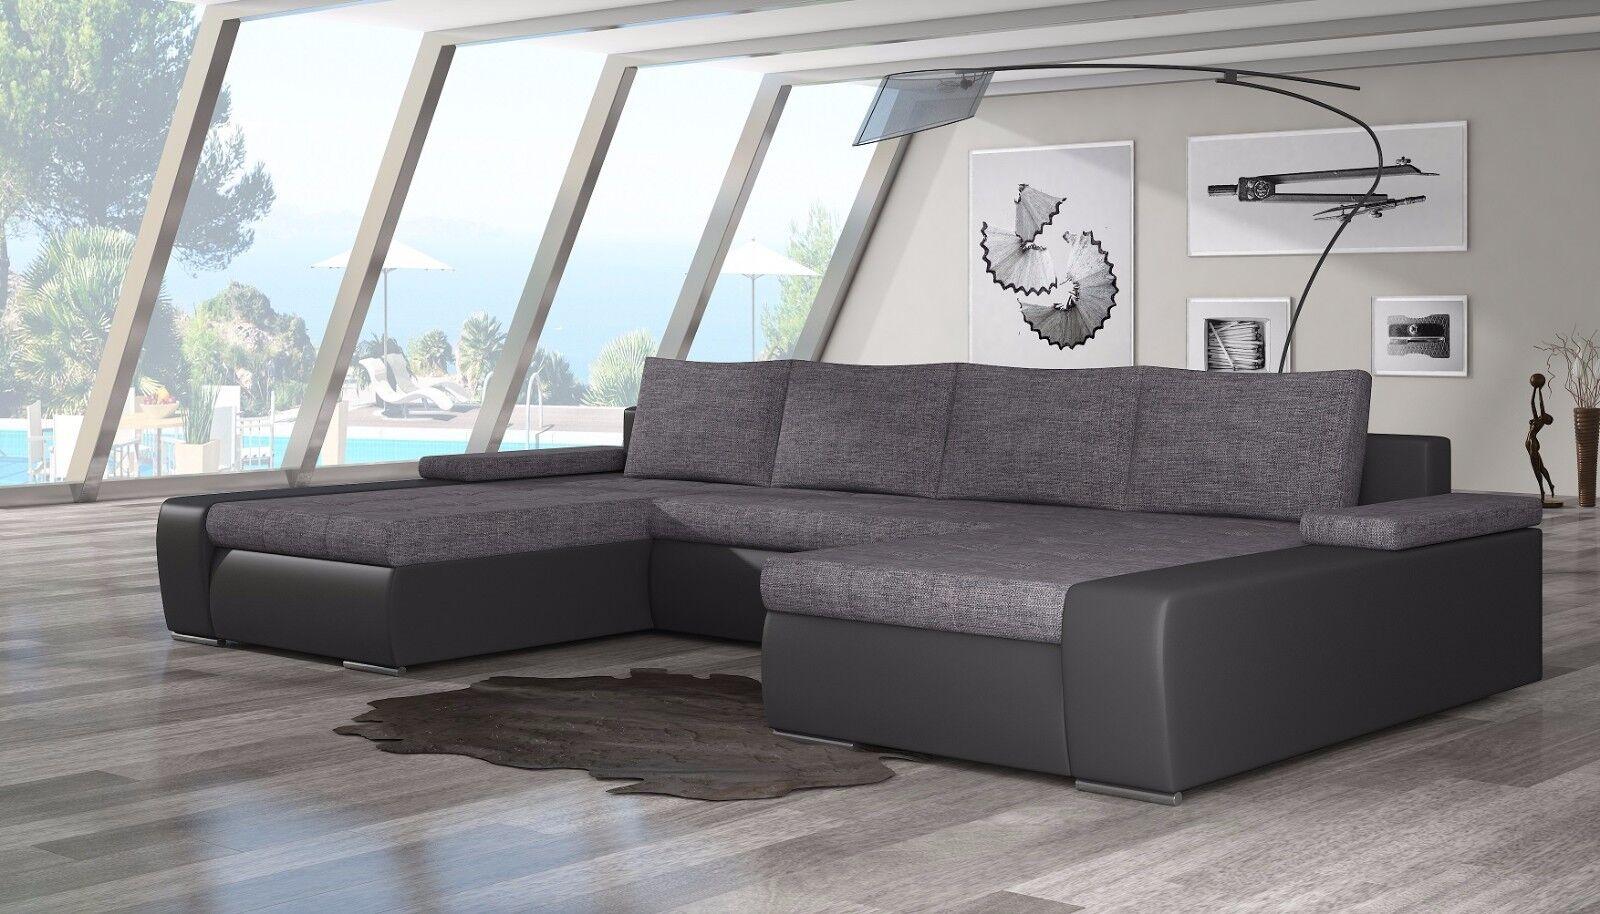 Wohnlandschaft couch sofa marion u form polstergarnitur for Polstergarnitur u form